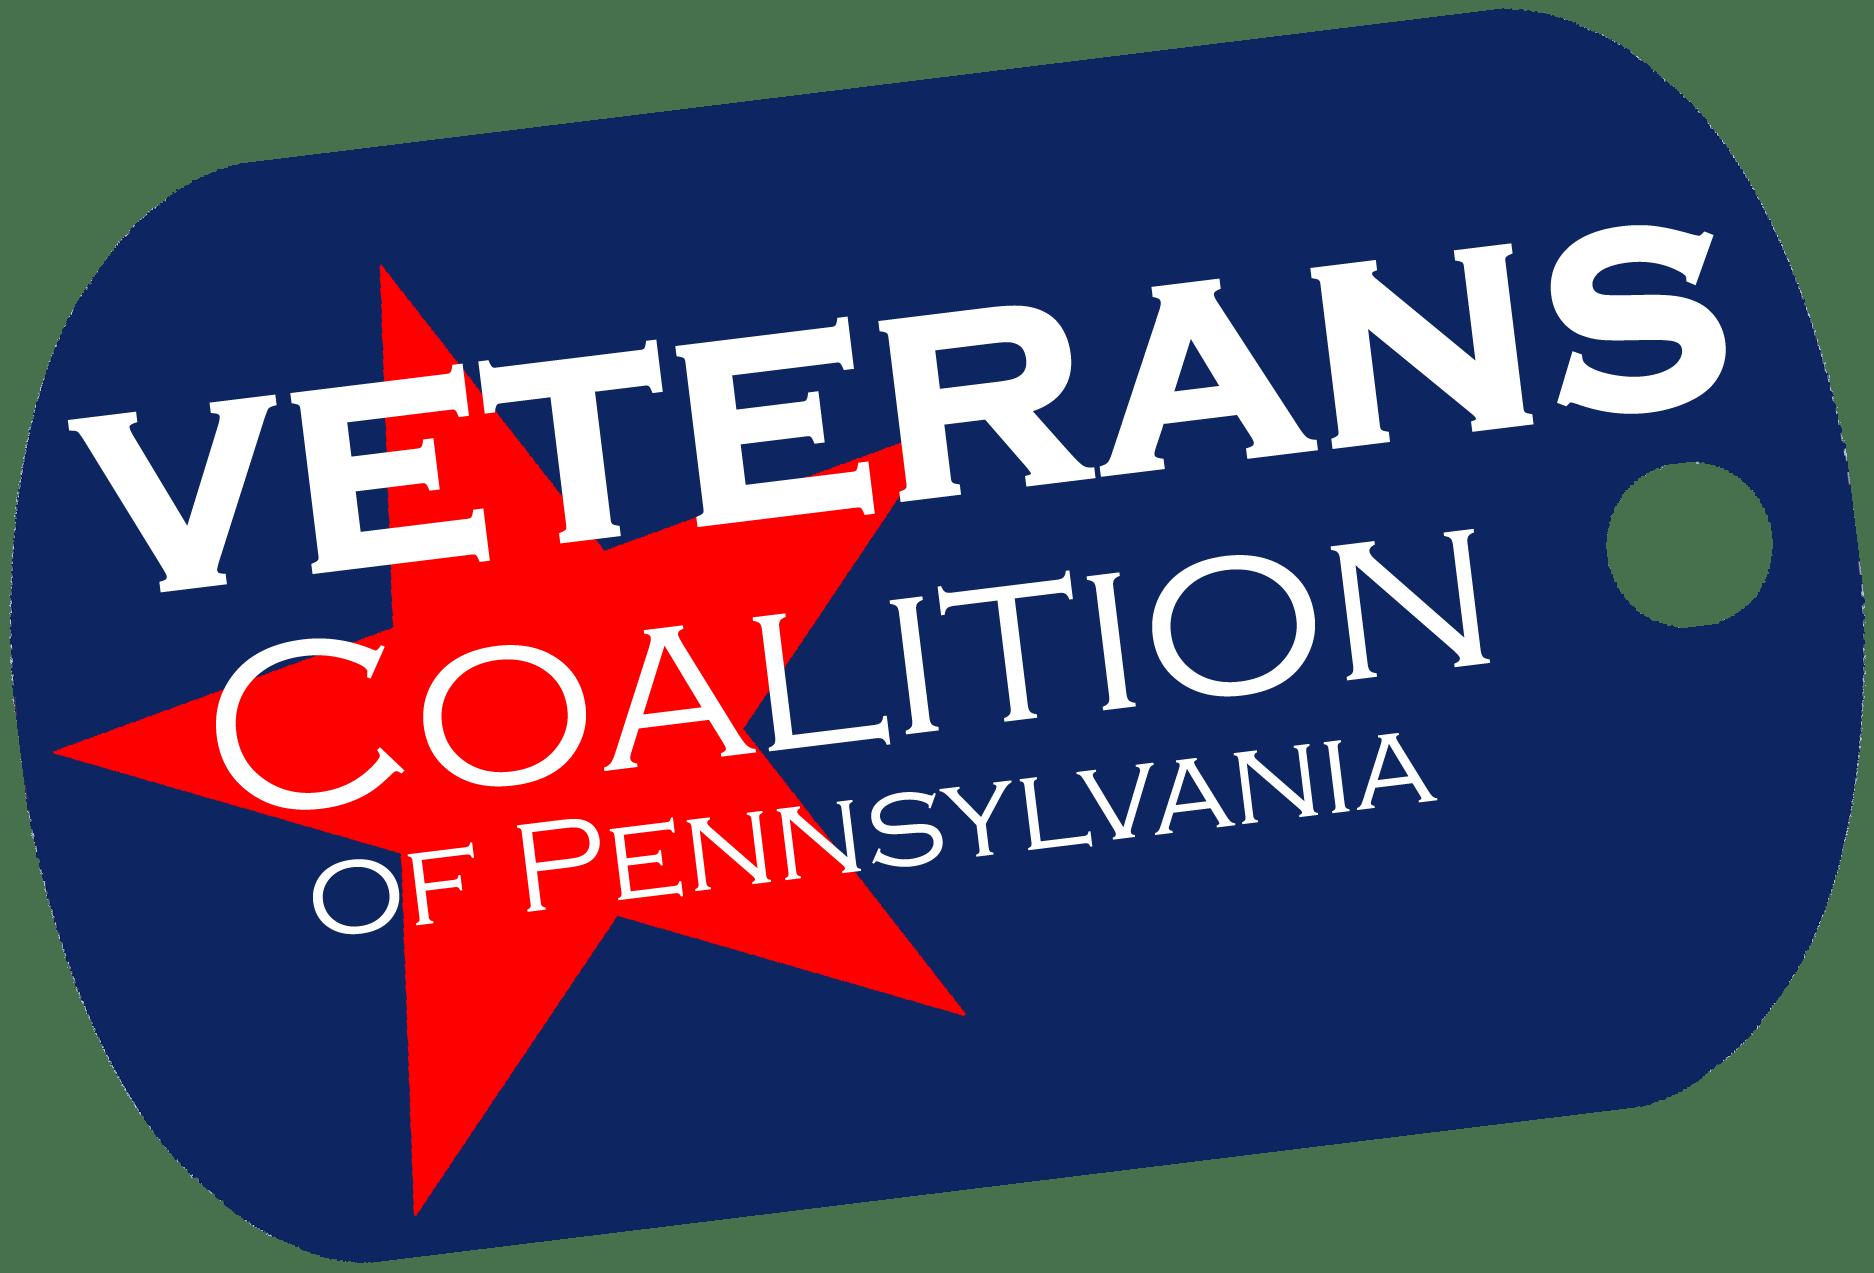 Veterans Coalition of Pennsylvania Logo